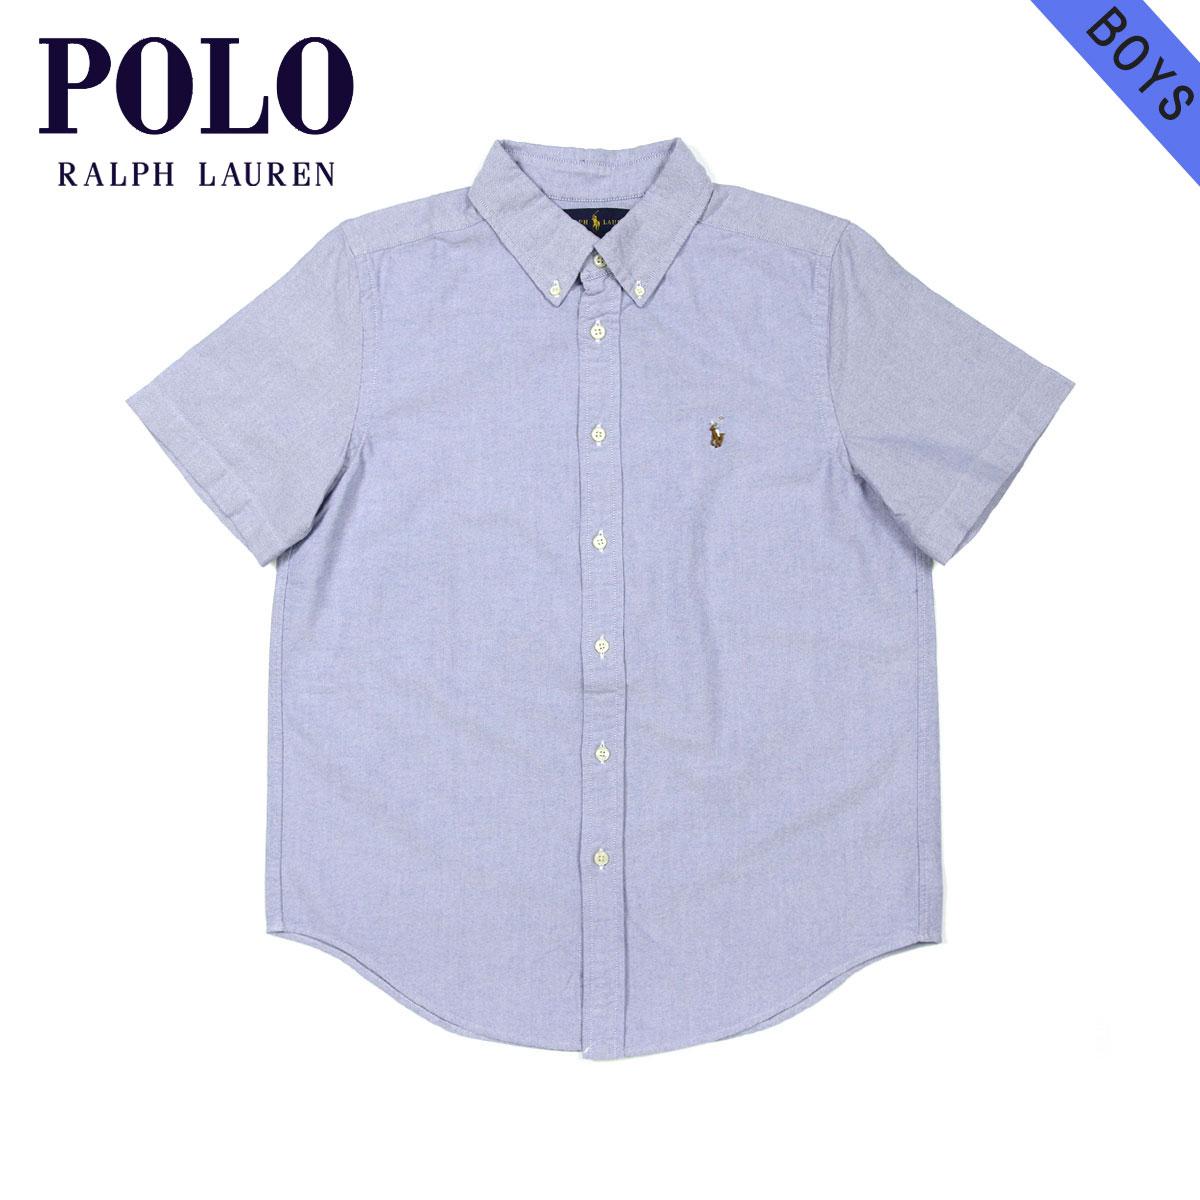 Polo Children Short Children's Sleeves Cotton Kids Boys Shirt Ralph Article Regular Oxf Lauren Clothes eQrCodxBW